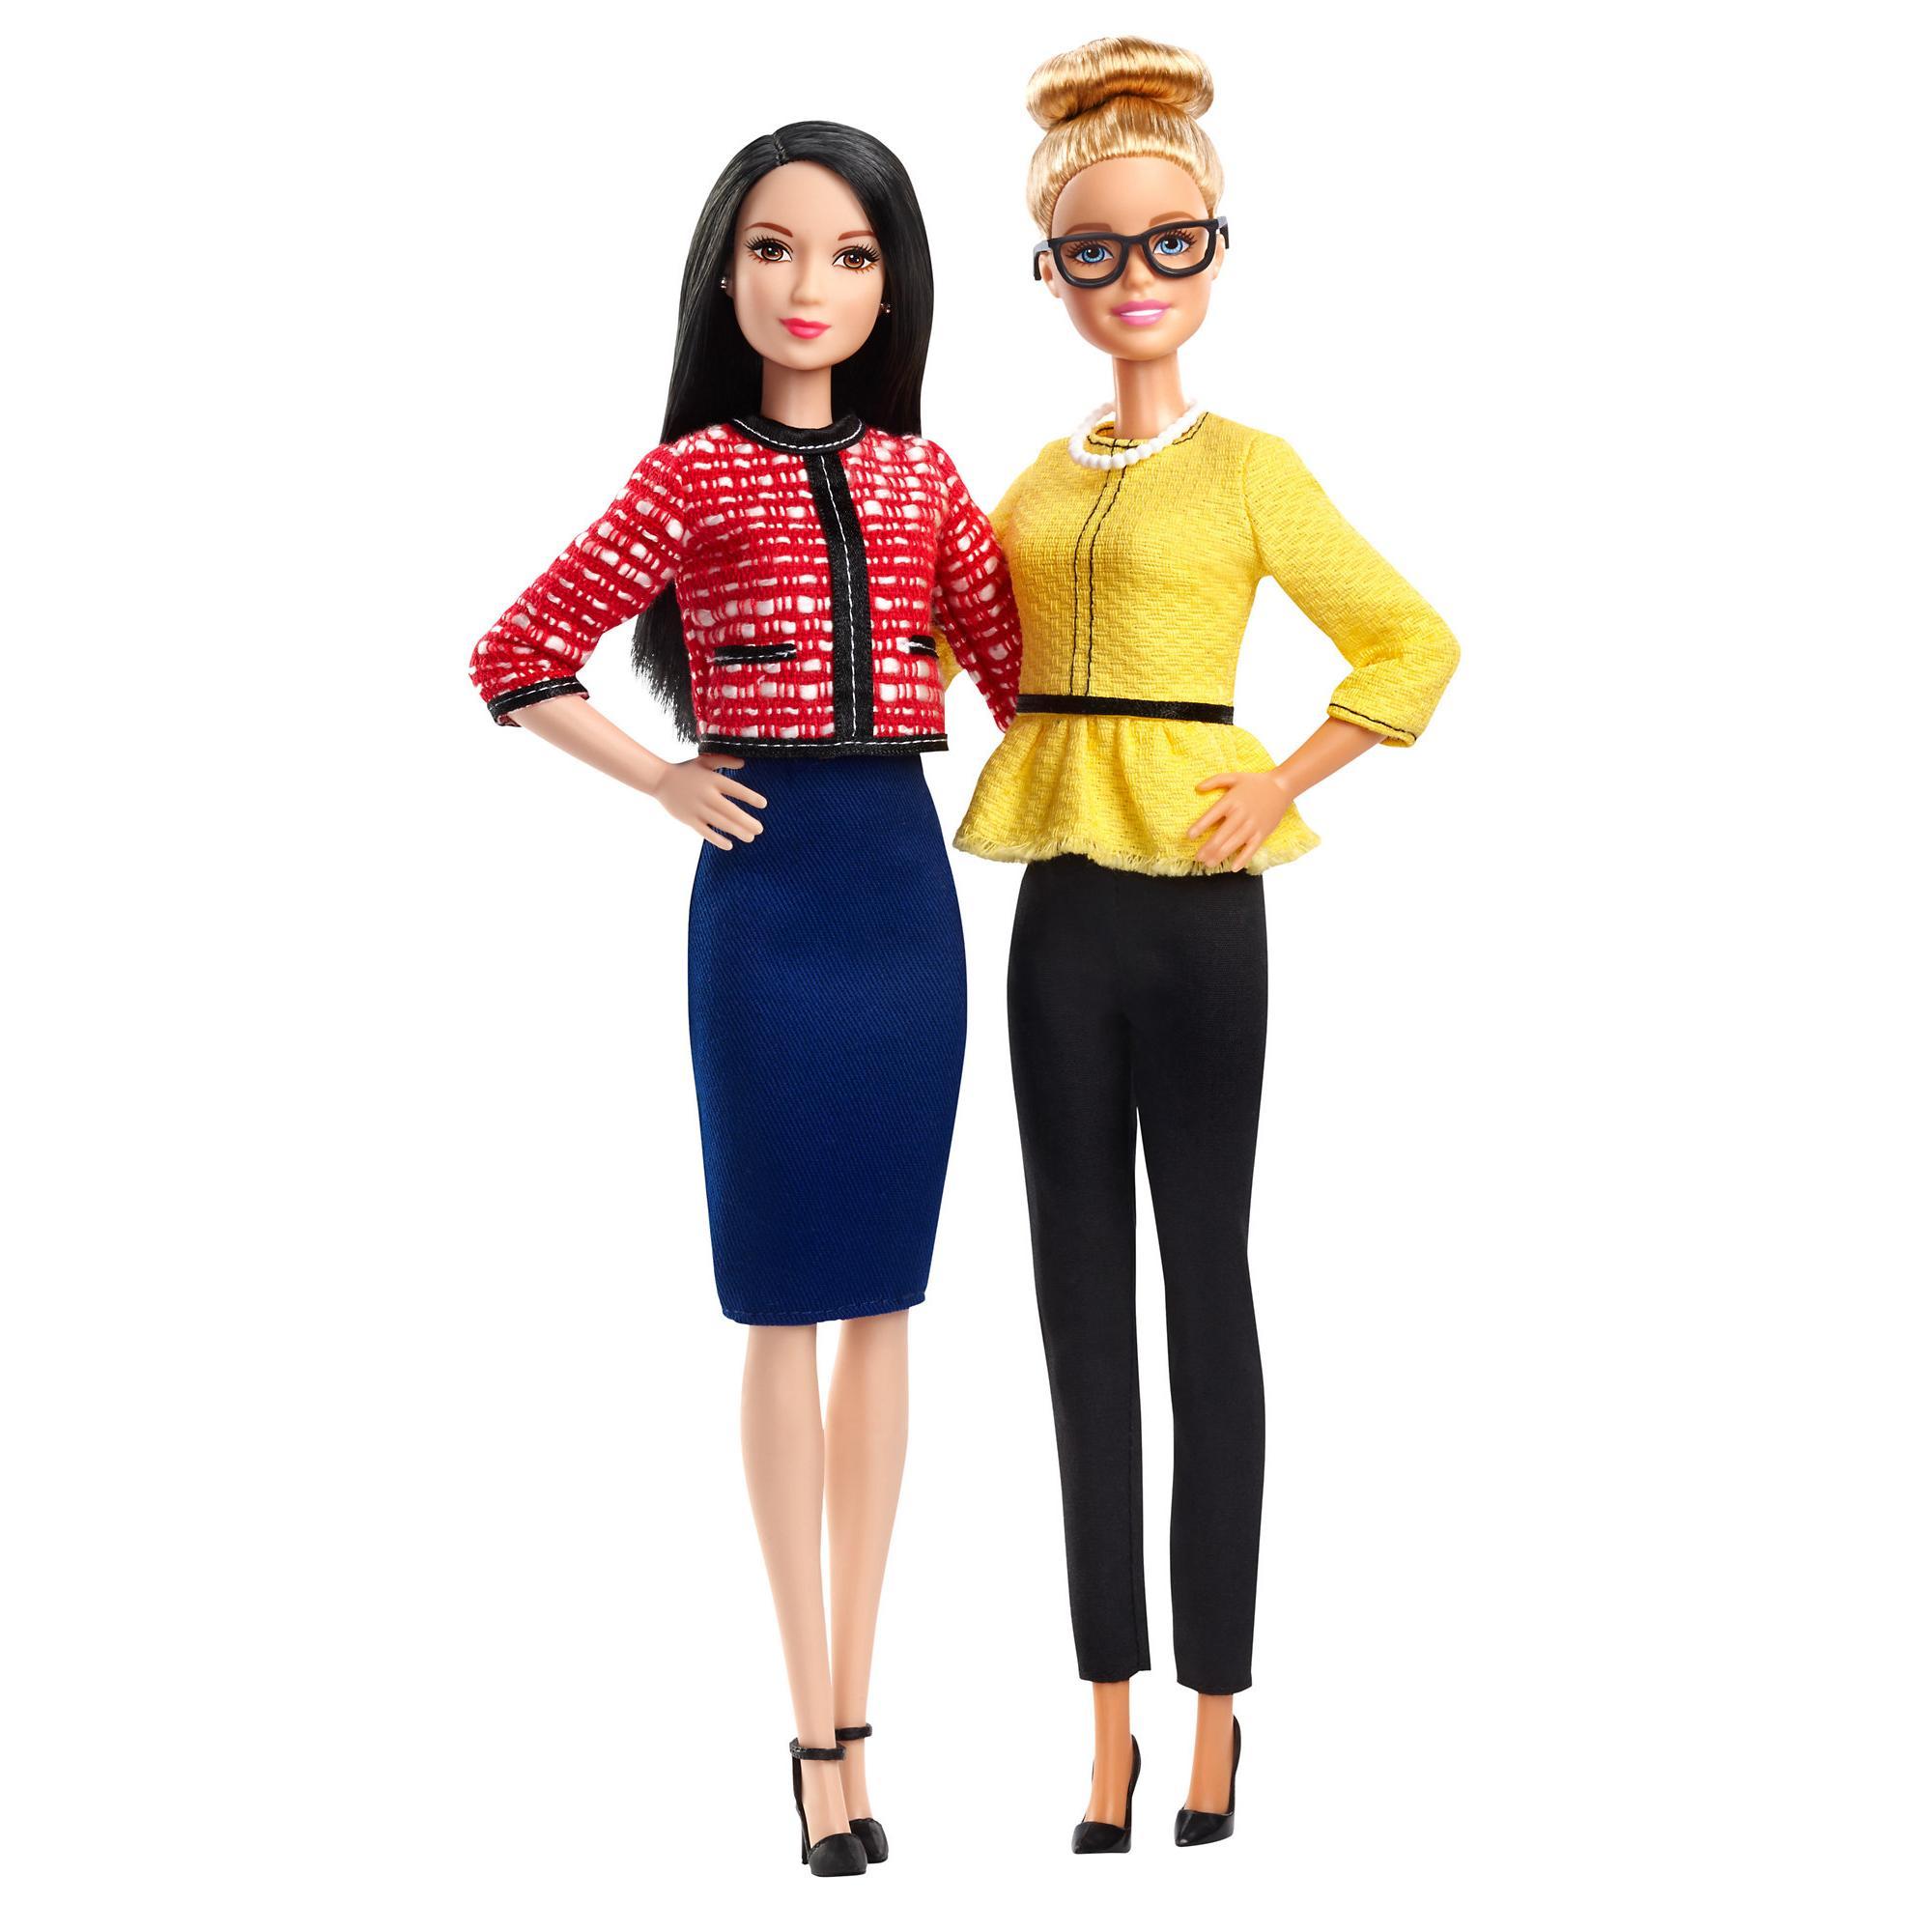 Barbie Careers President & Vice President Dolls